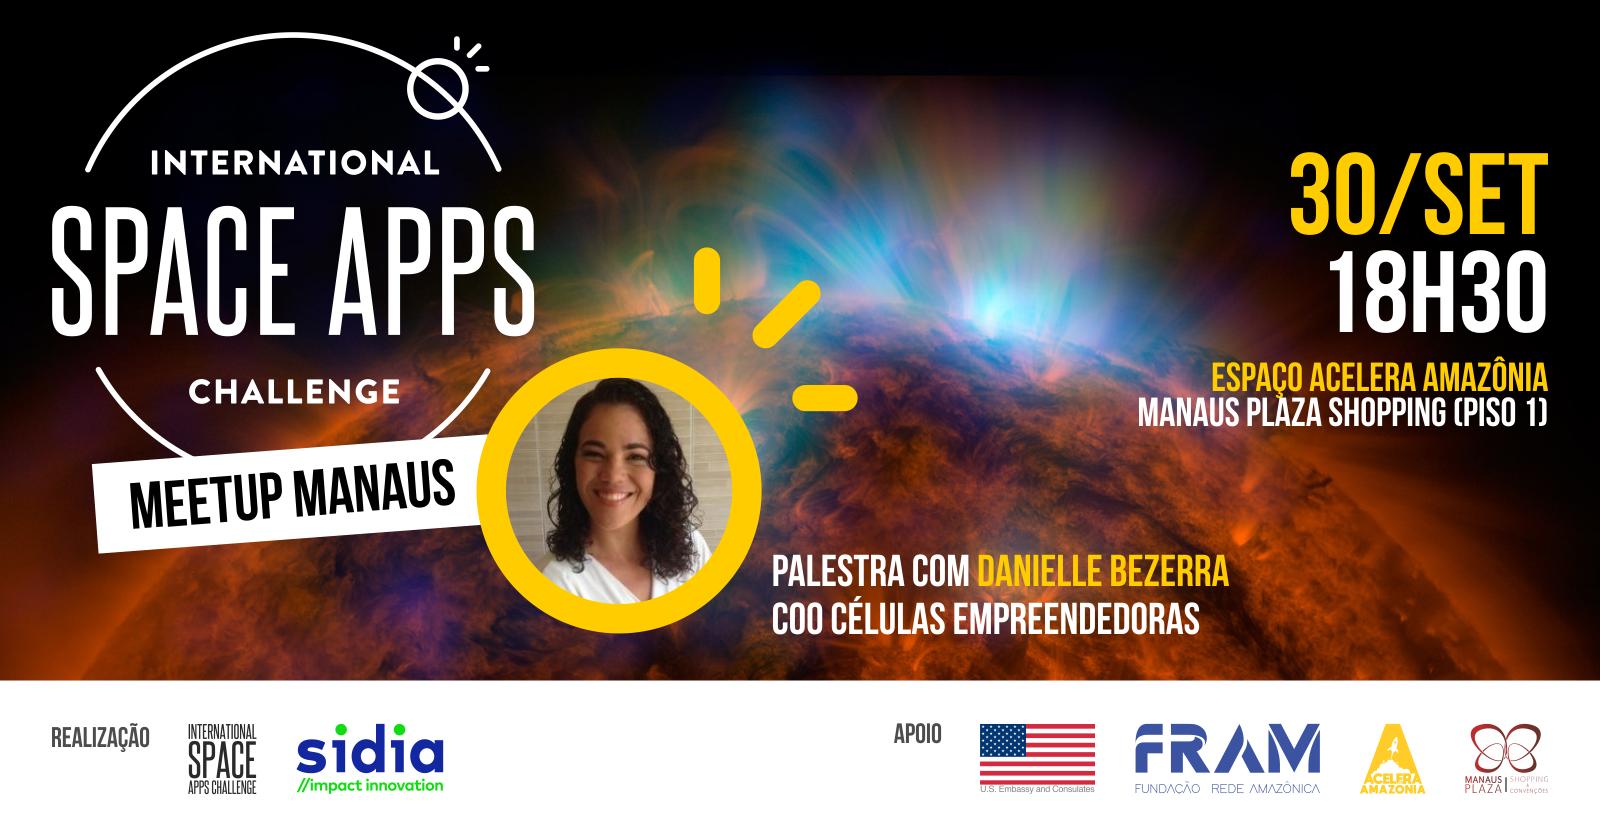 Meetup Nasa Space Apps Manaus Sympla